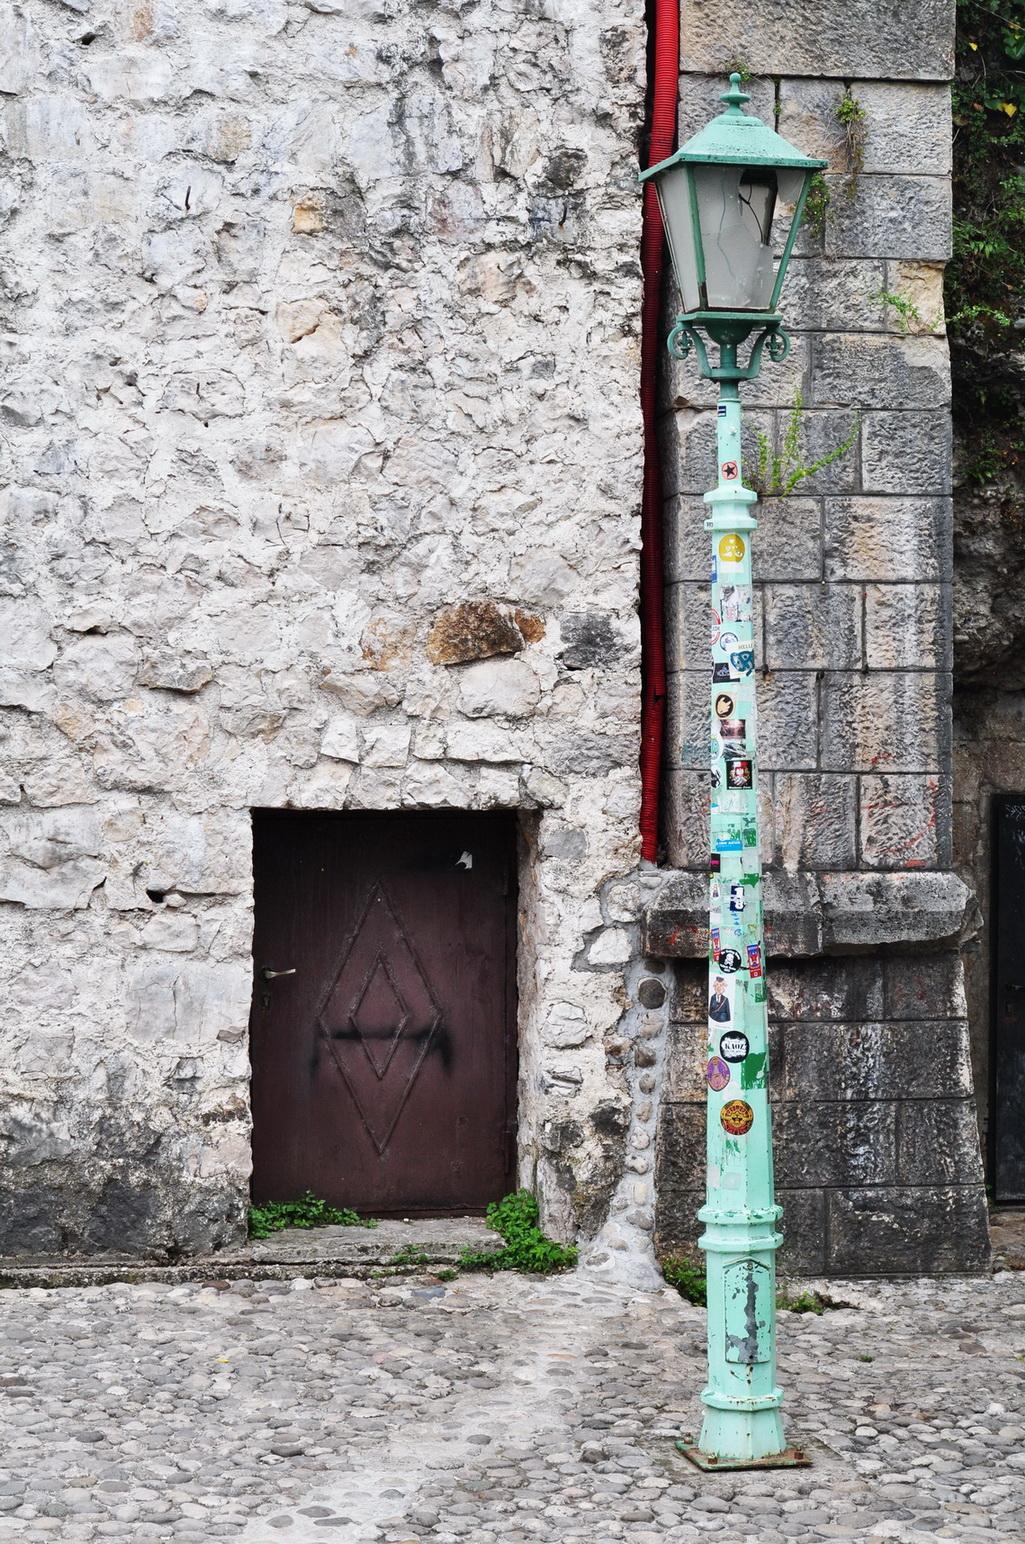 Mostar_02_luogolungo